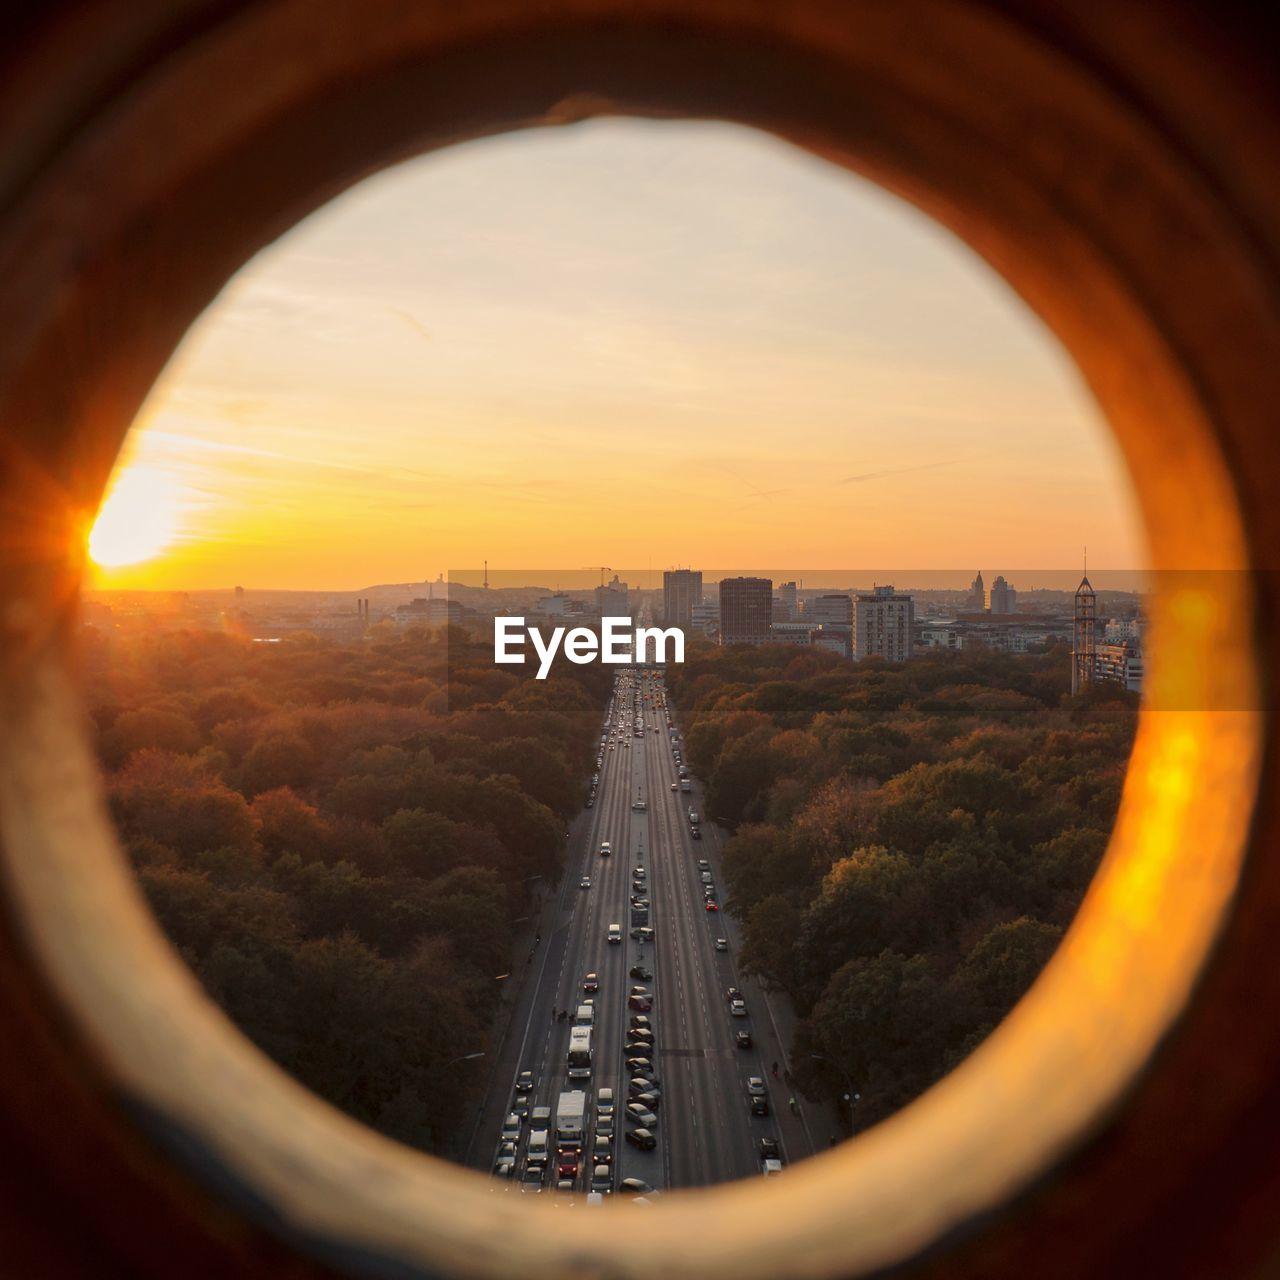 PANORAMIC VIEW OF CITY SEEN THROUGH WINDOW